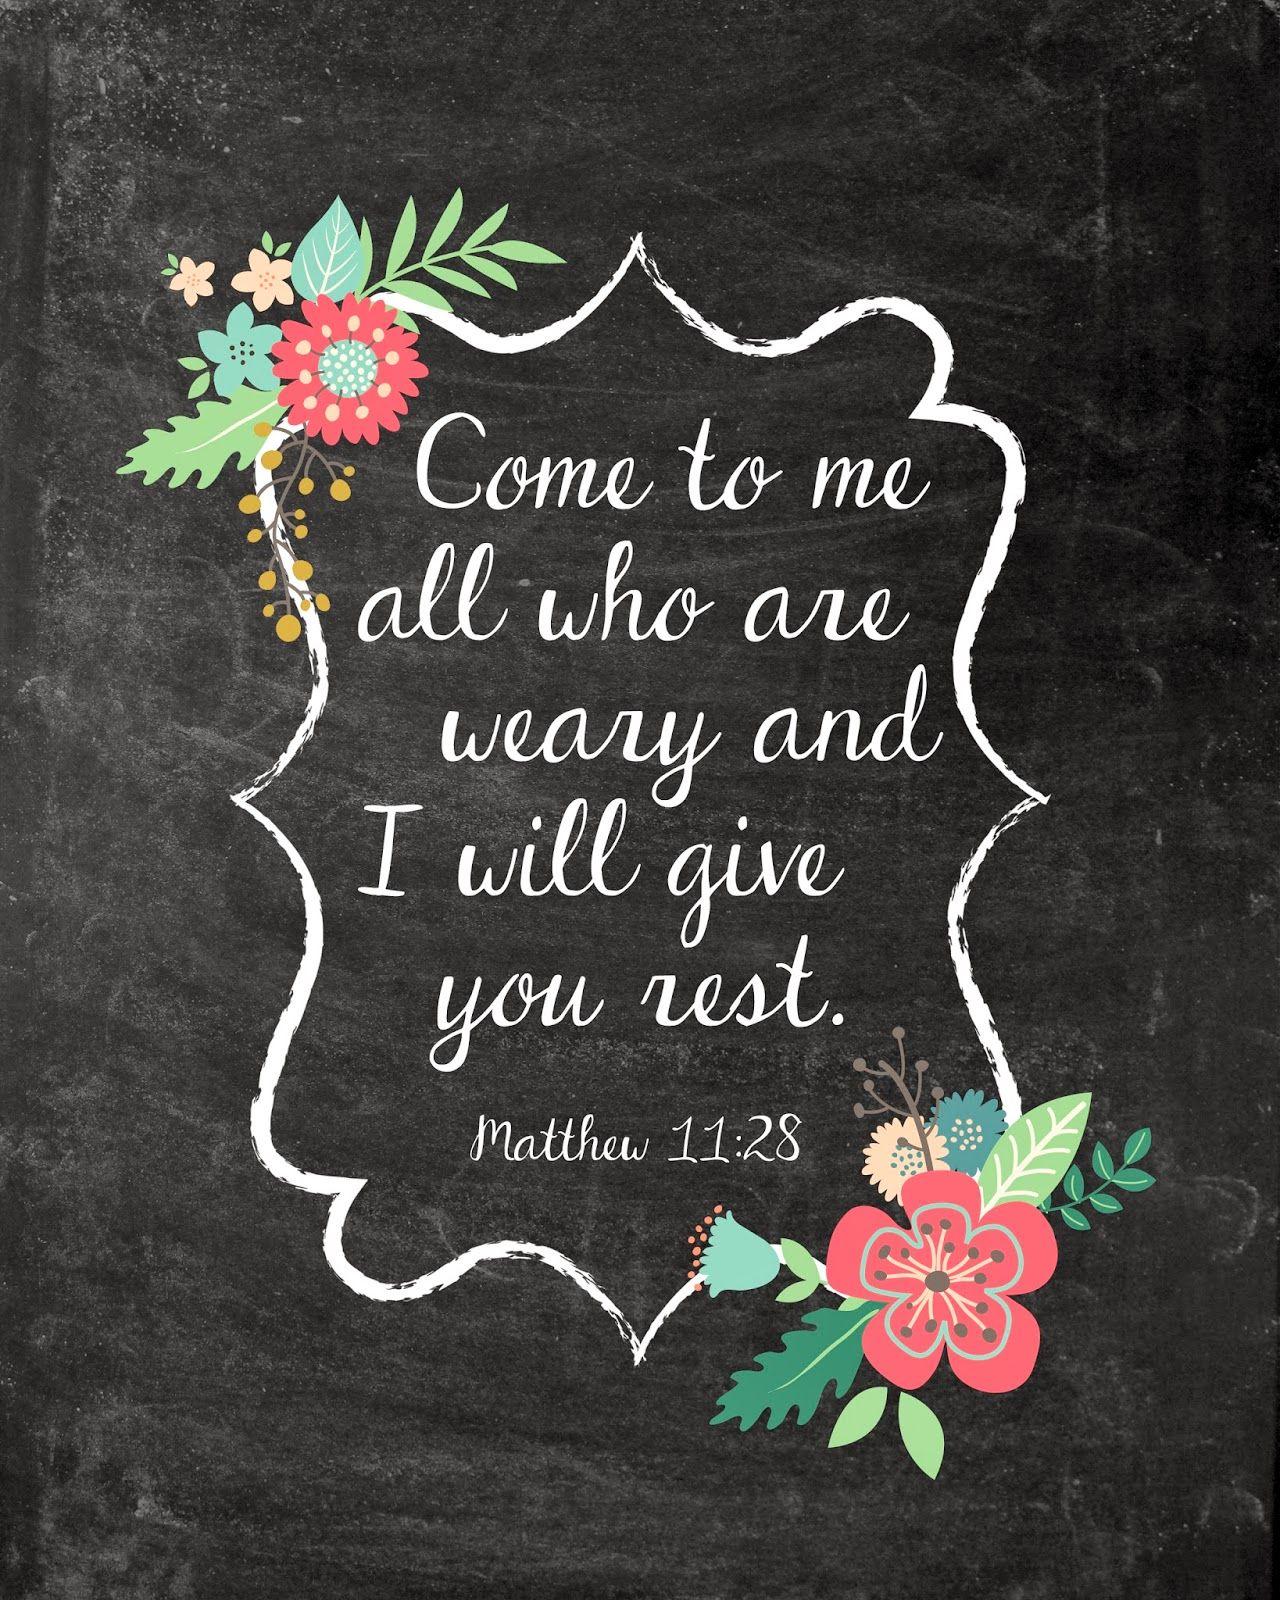 Inspirational Quotes On Pinterest: Free Printable Wall Art. Matthew 11:28